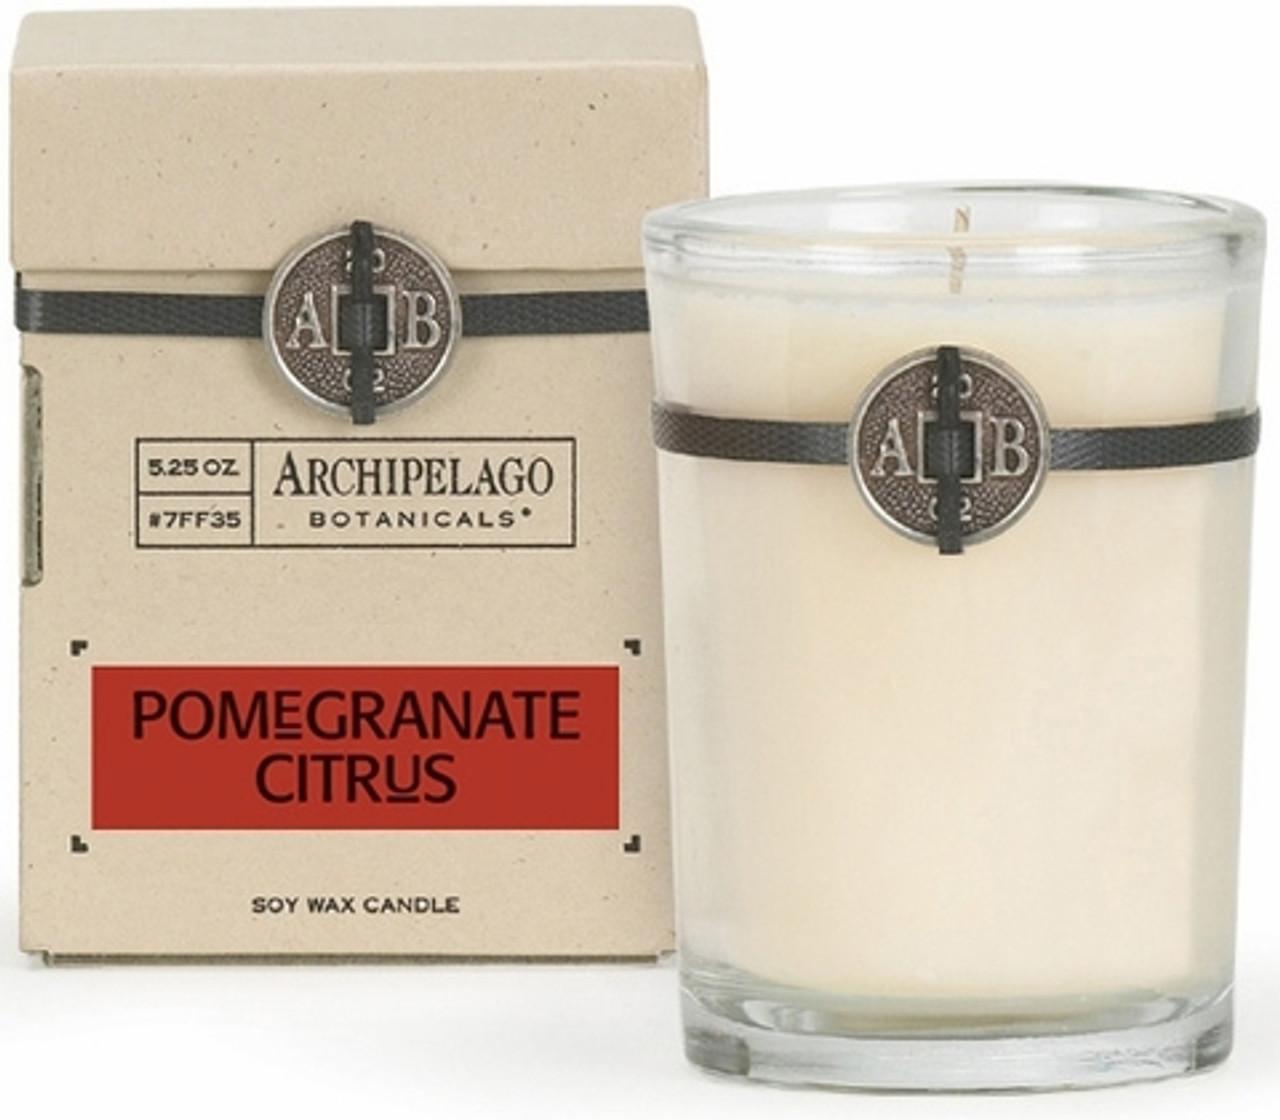 Archipelago Pomegranate Citrus Soy Candle